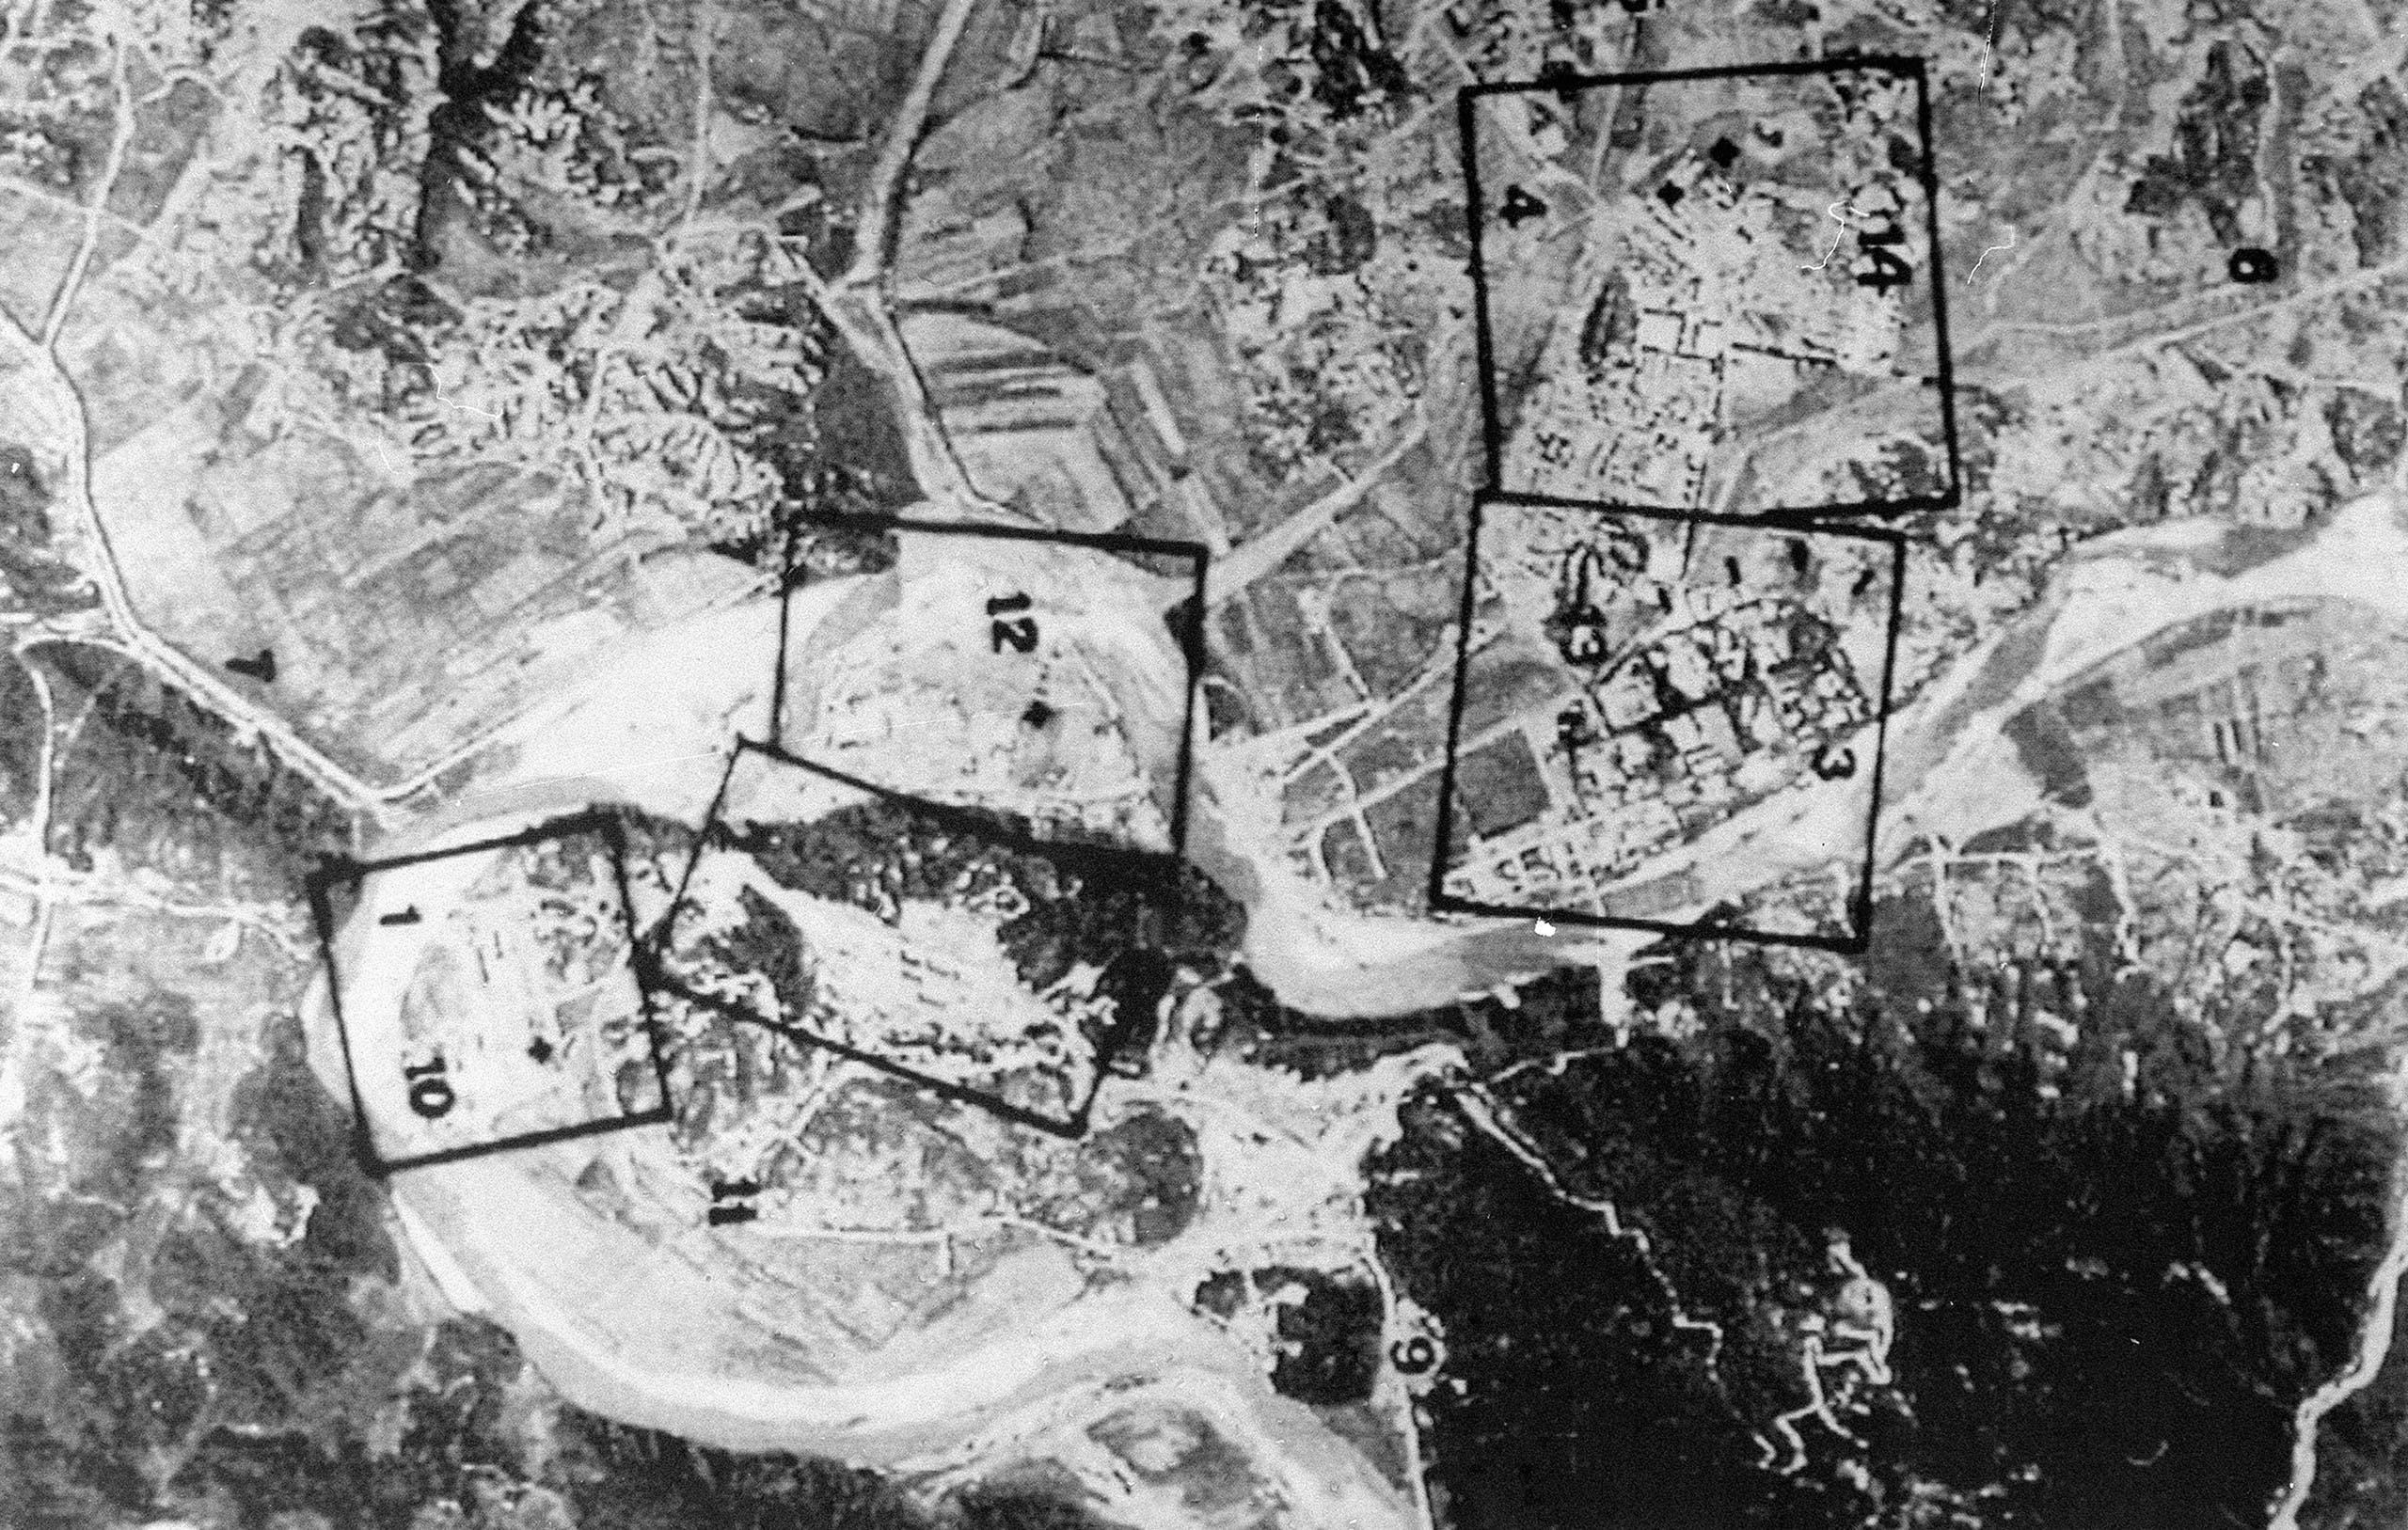 مجمع يونغبيون النووي (فرانس برس)